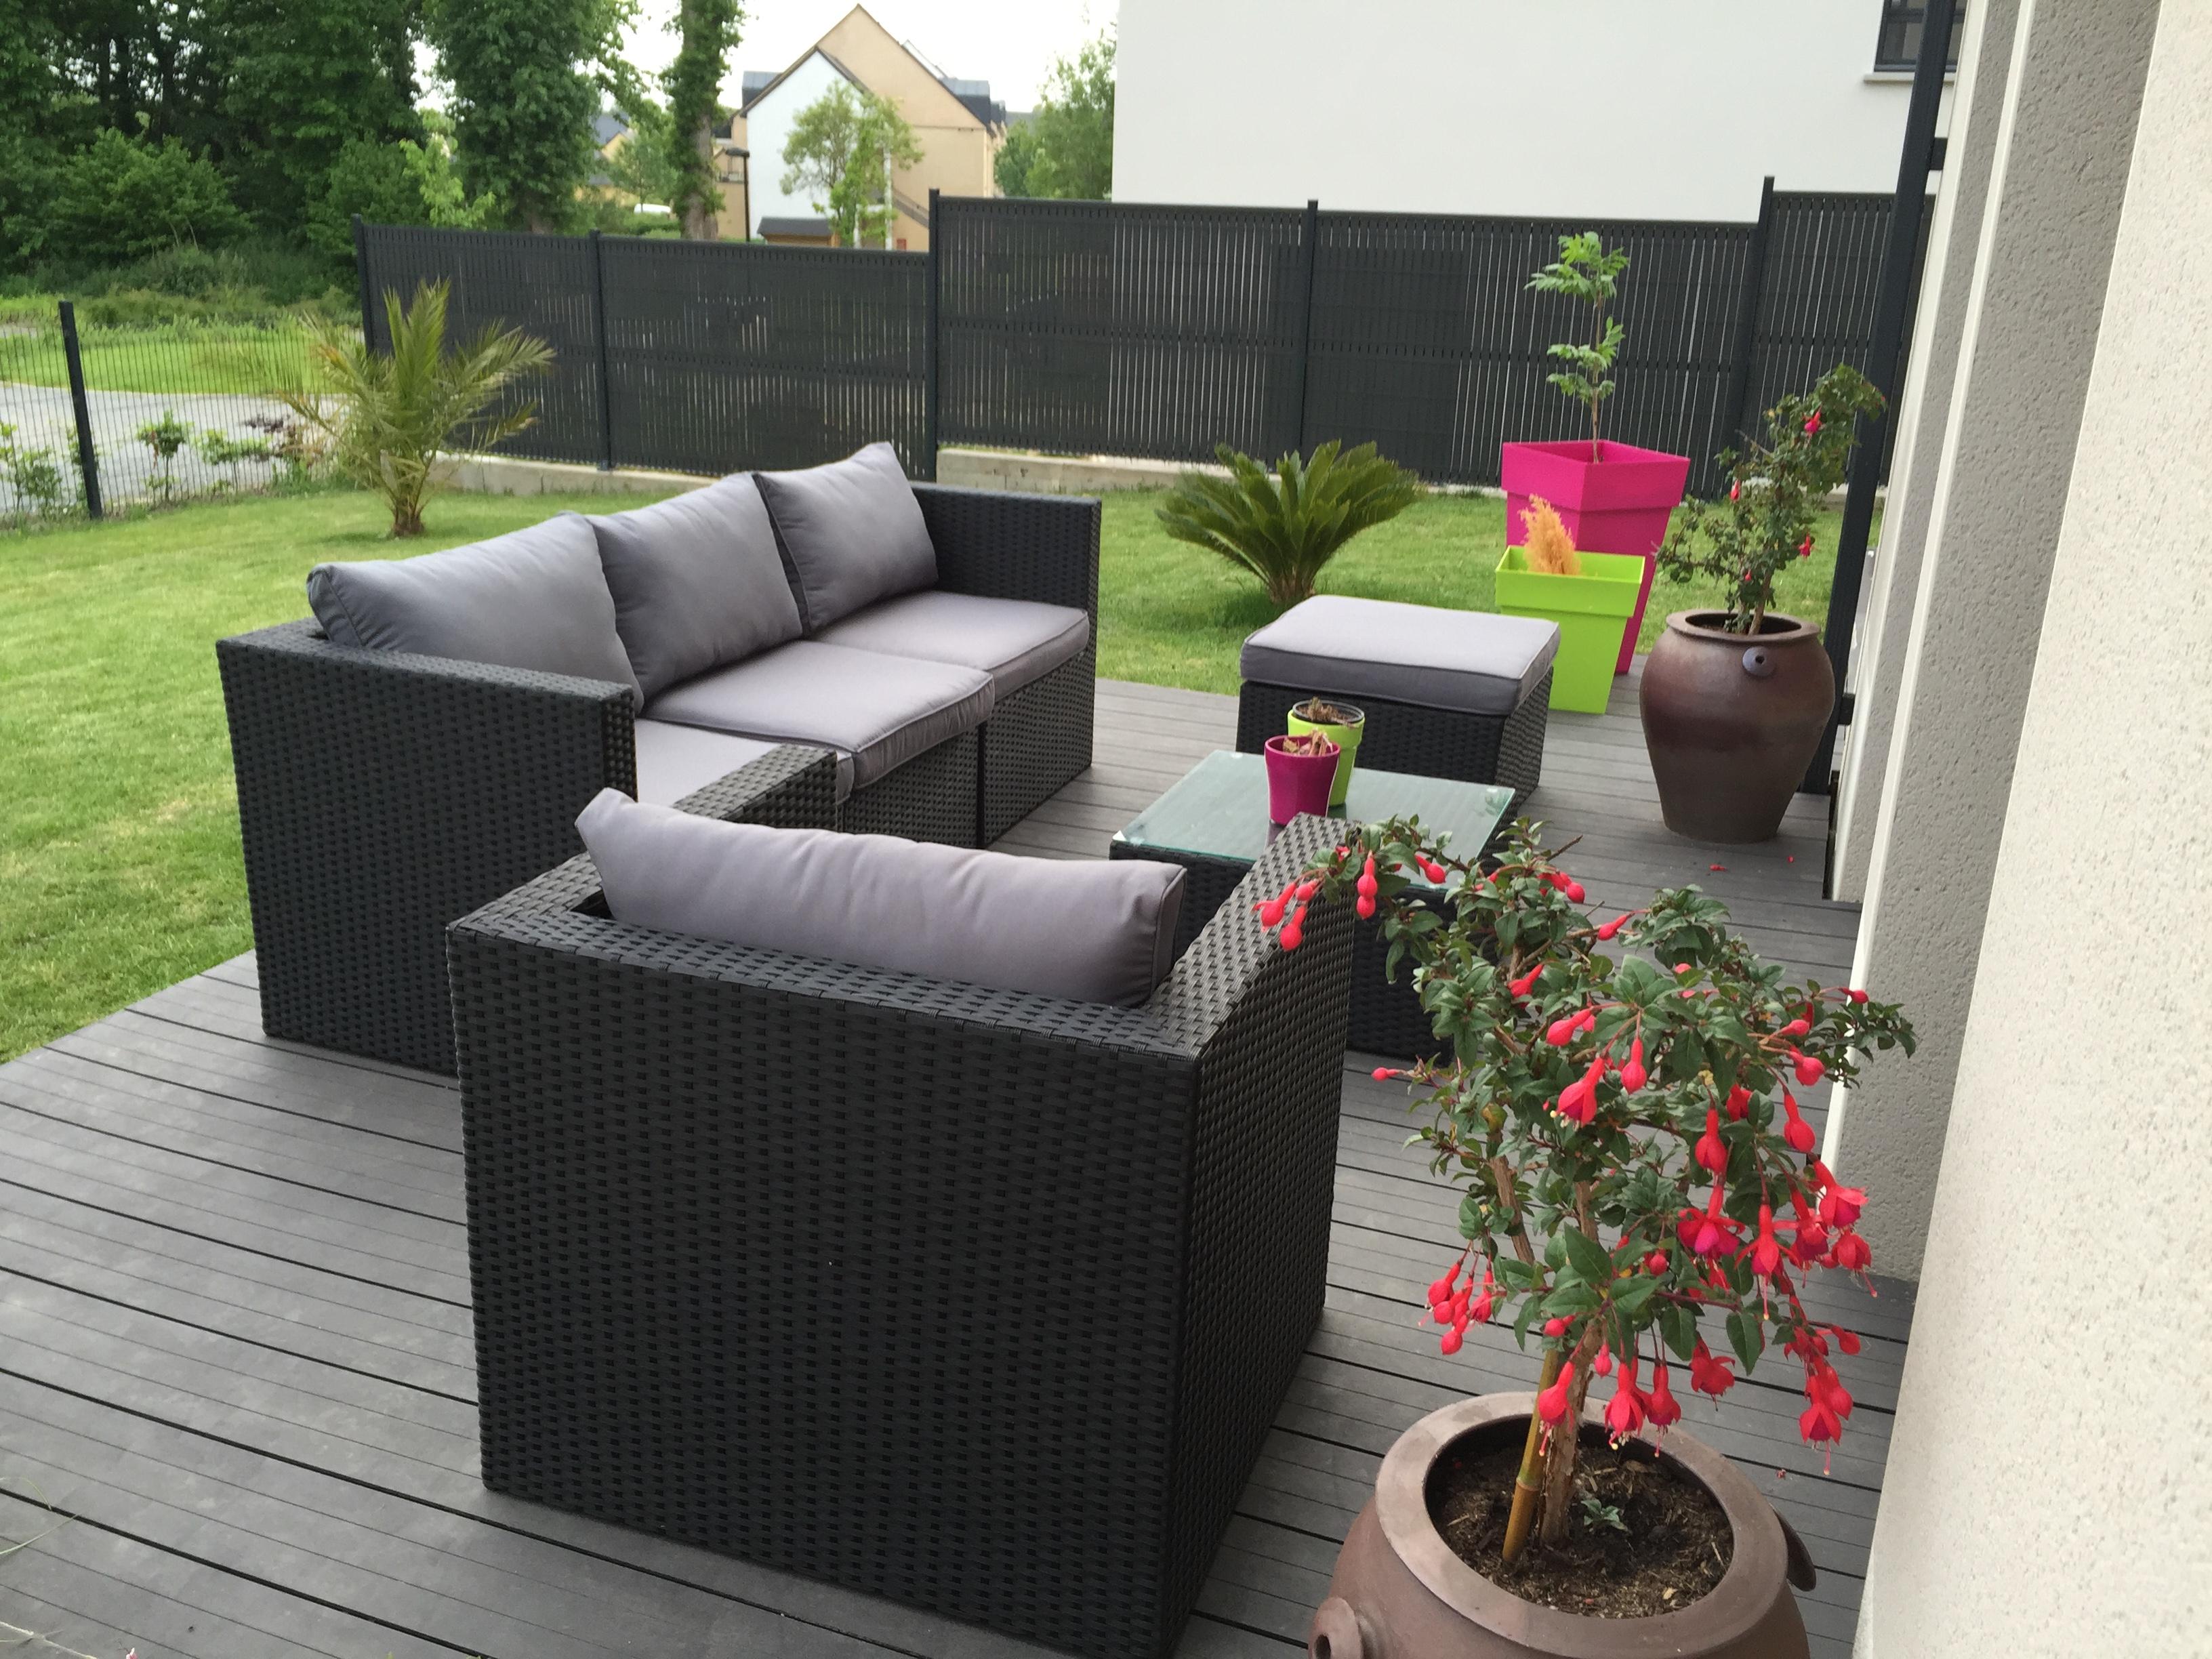 Prix salon de jardin en osier - Mailleraye.fr jardin